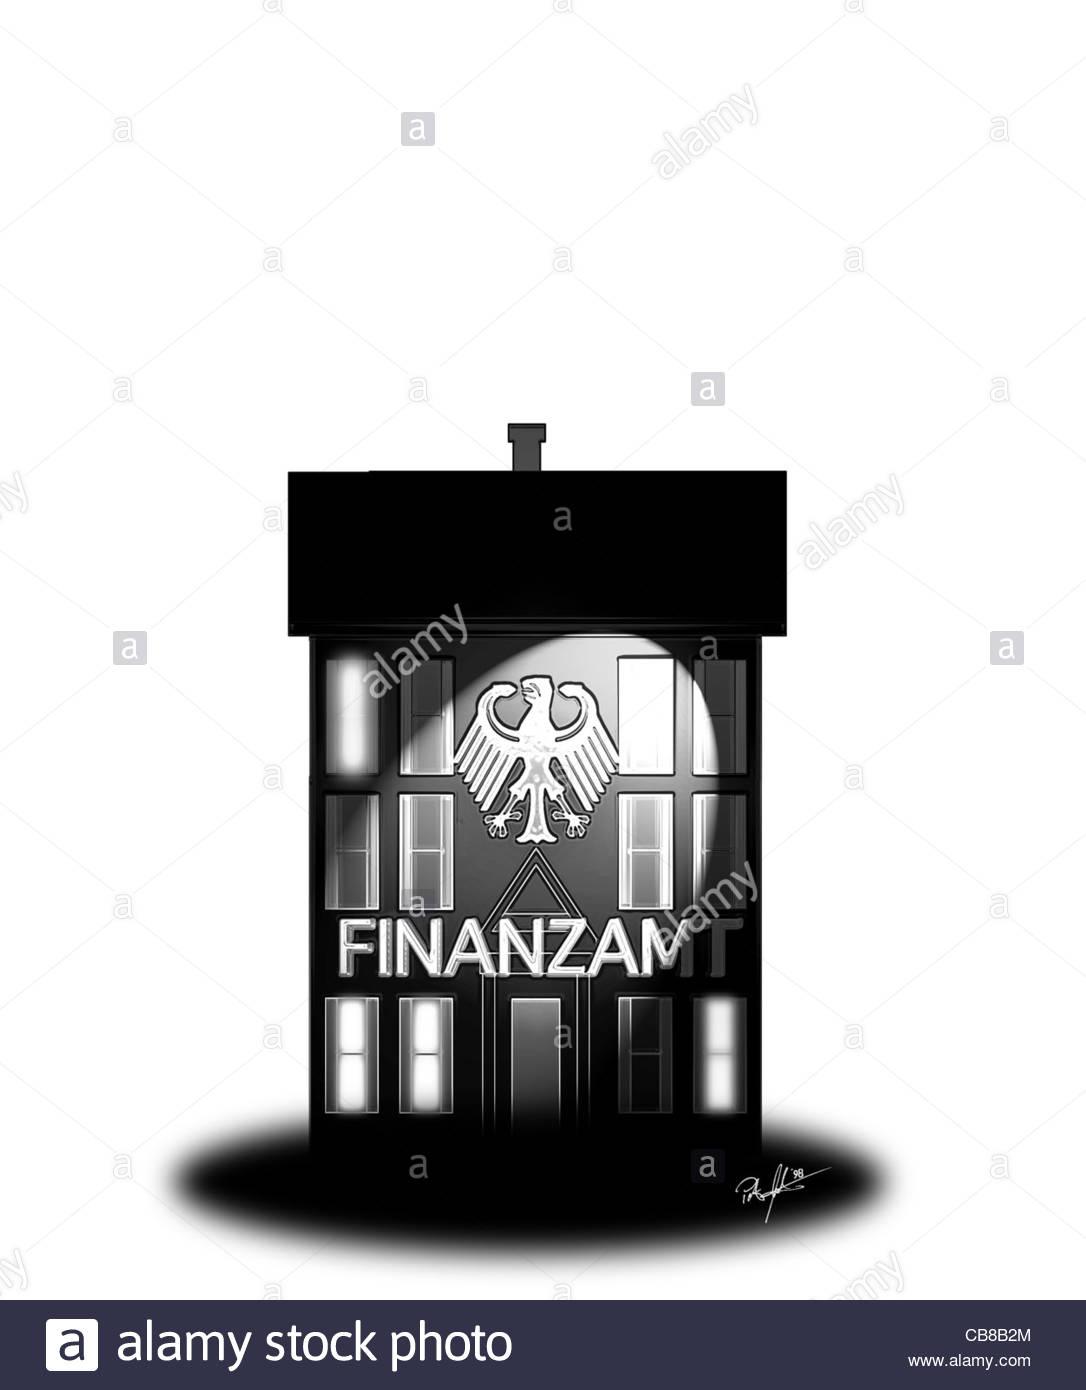 Subvensionen Stock Photos & Subvensionen Stock Images - Alamy